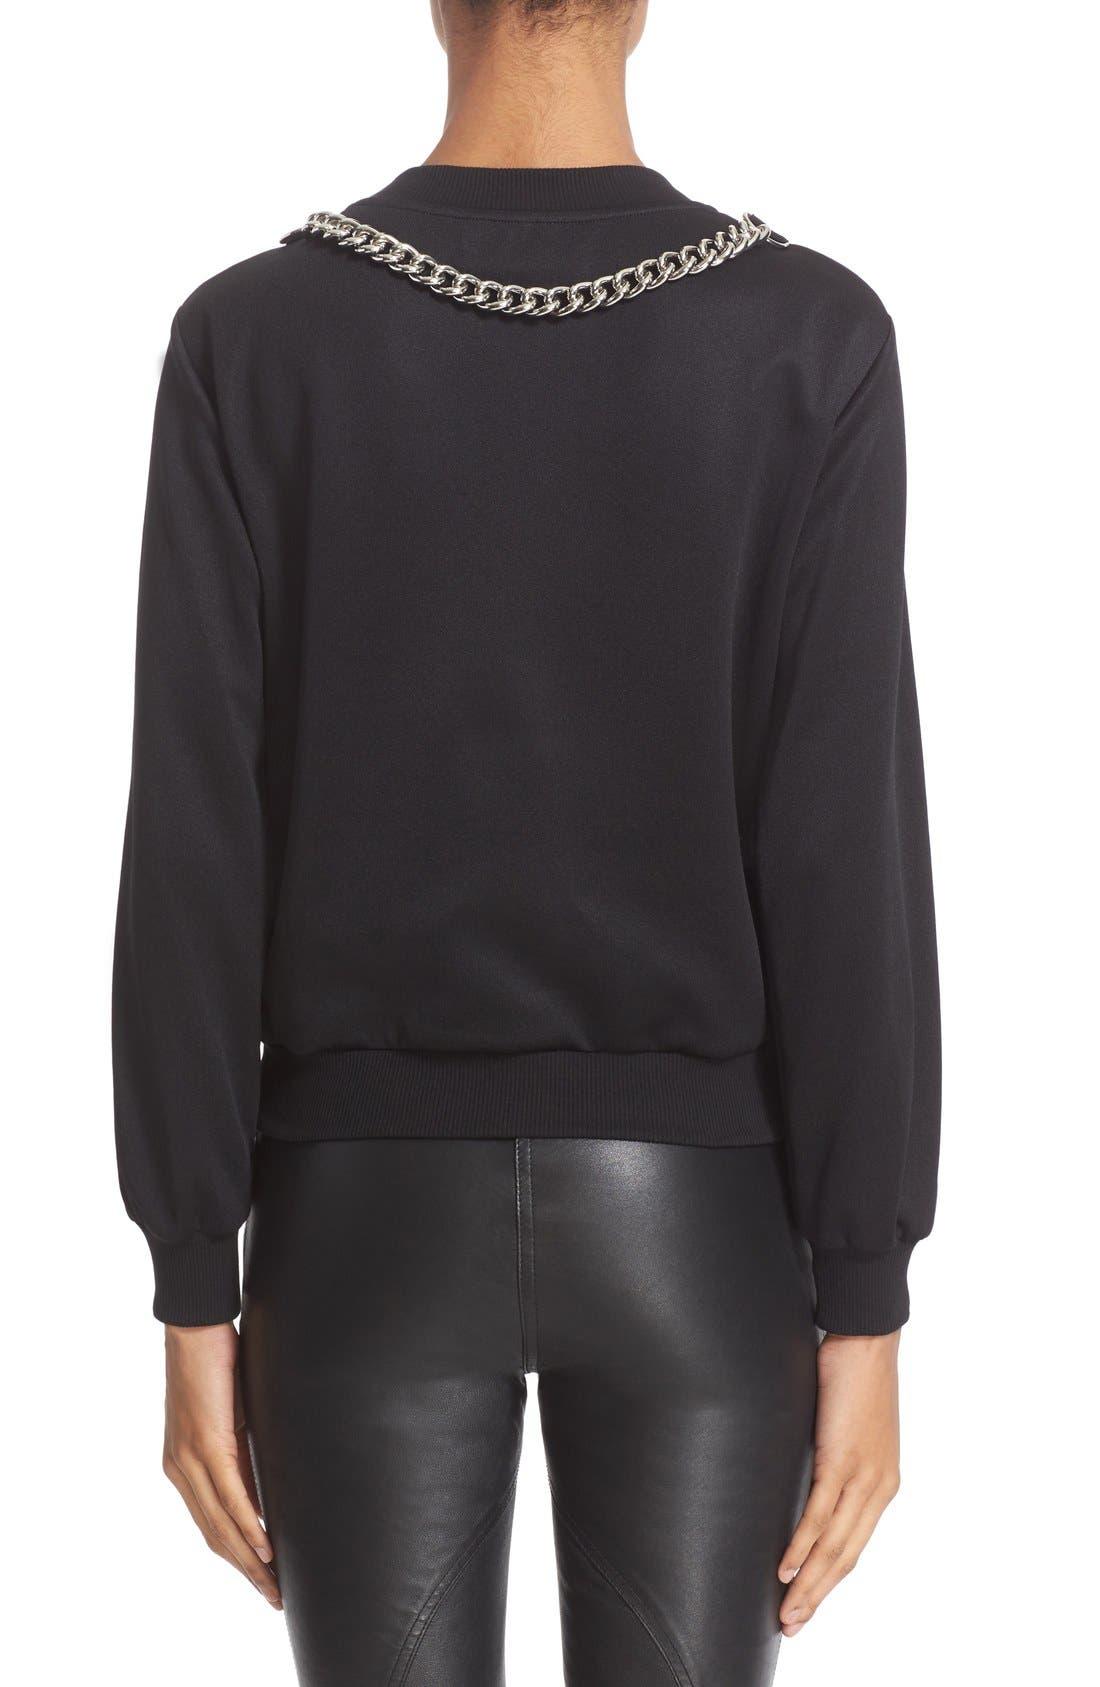 Alternate Image 2  - Moschino Chain & Faux Pearl Embellished Sweatshirt